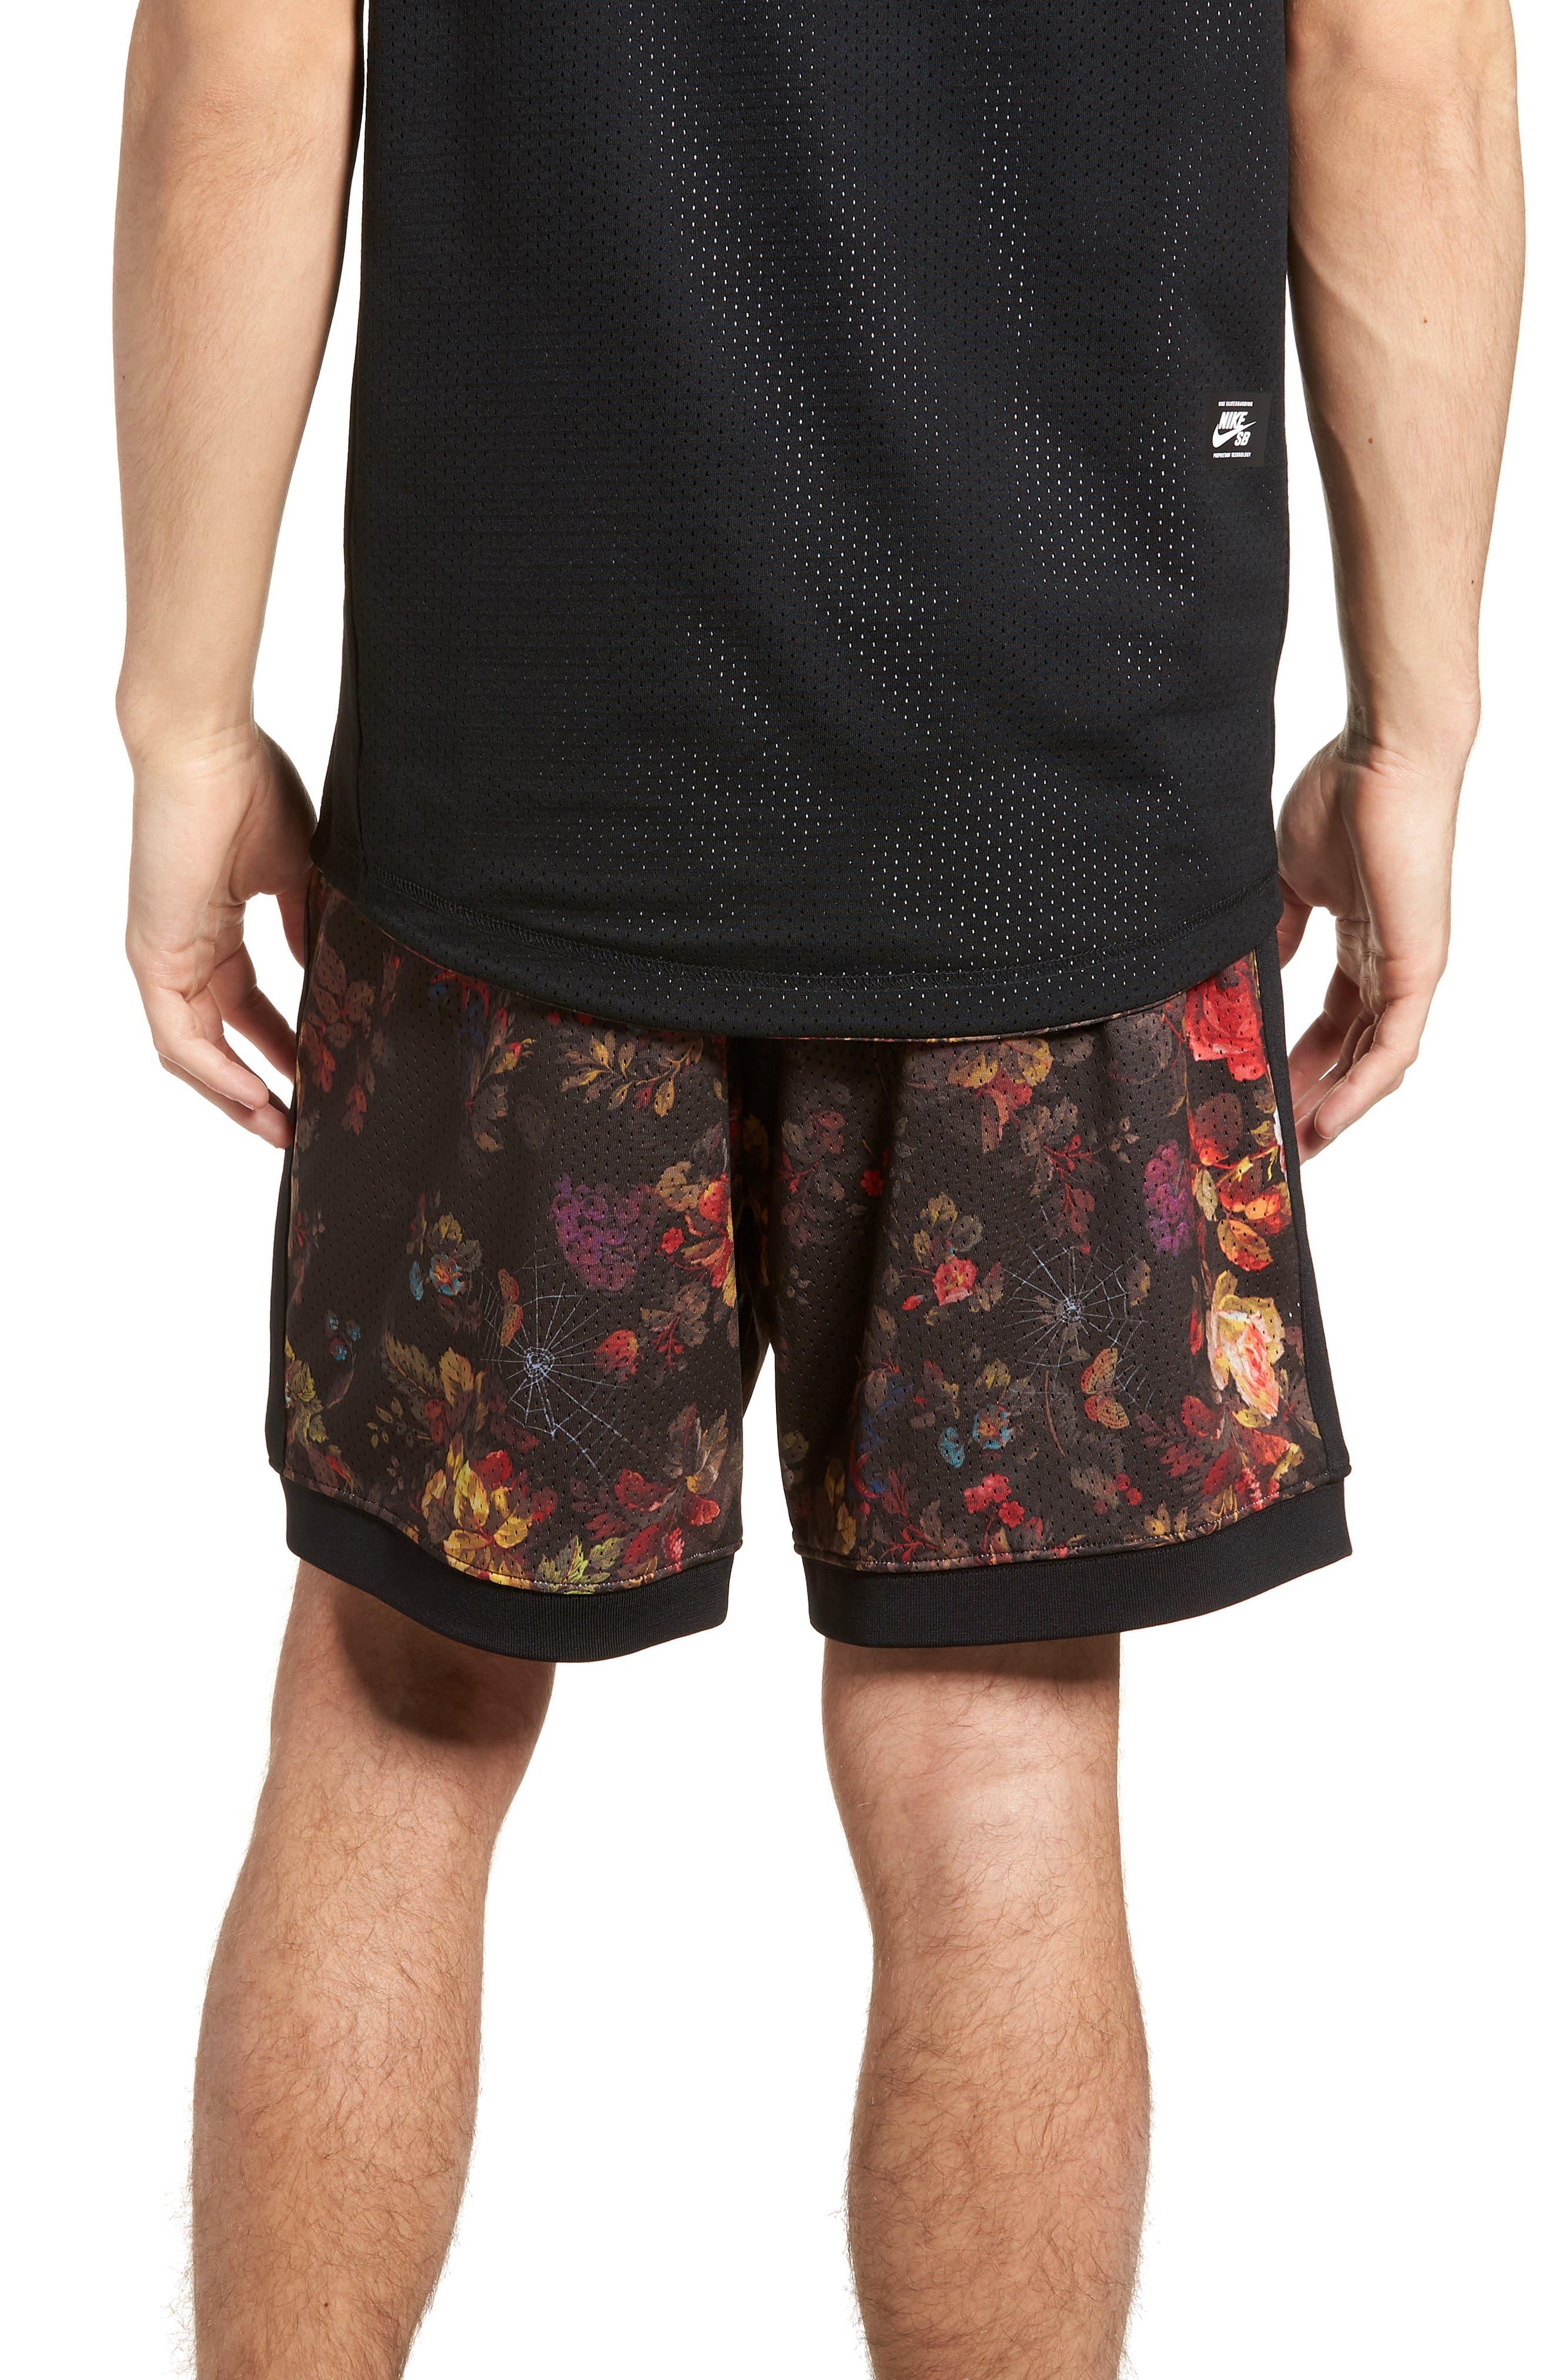 Dry Floral Shorts,                             Alternate thumbnail 2, color,                             BLACK/ WHITE